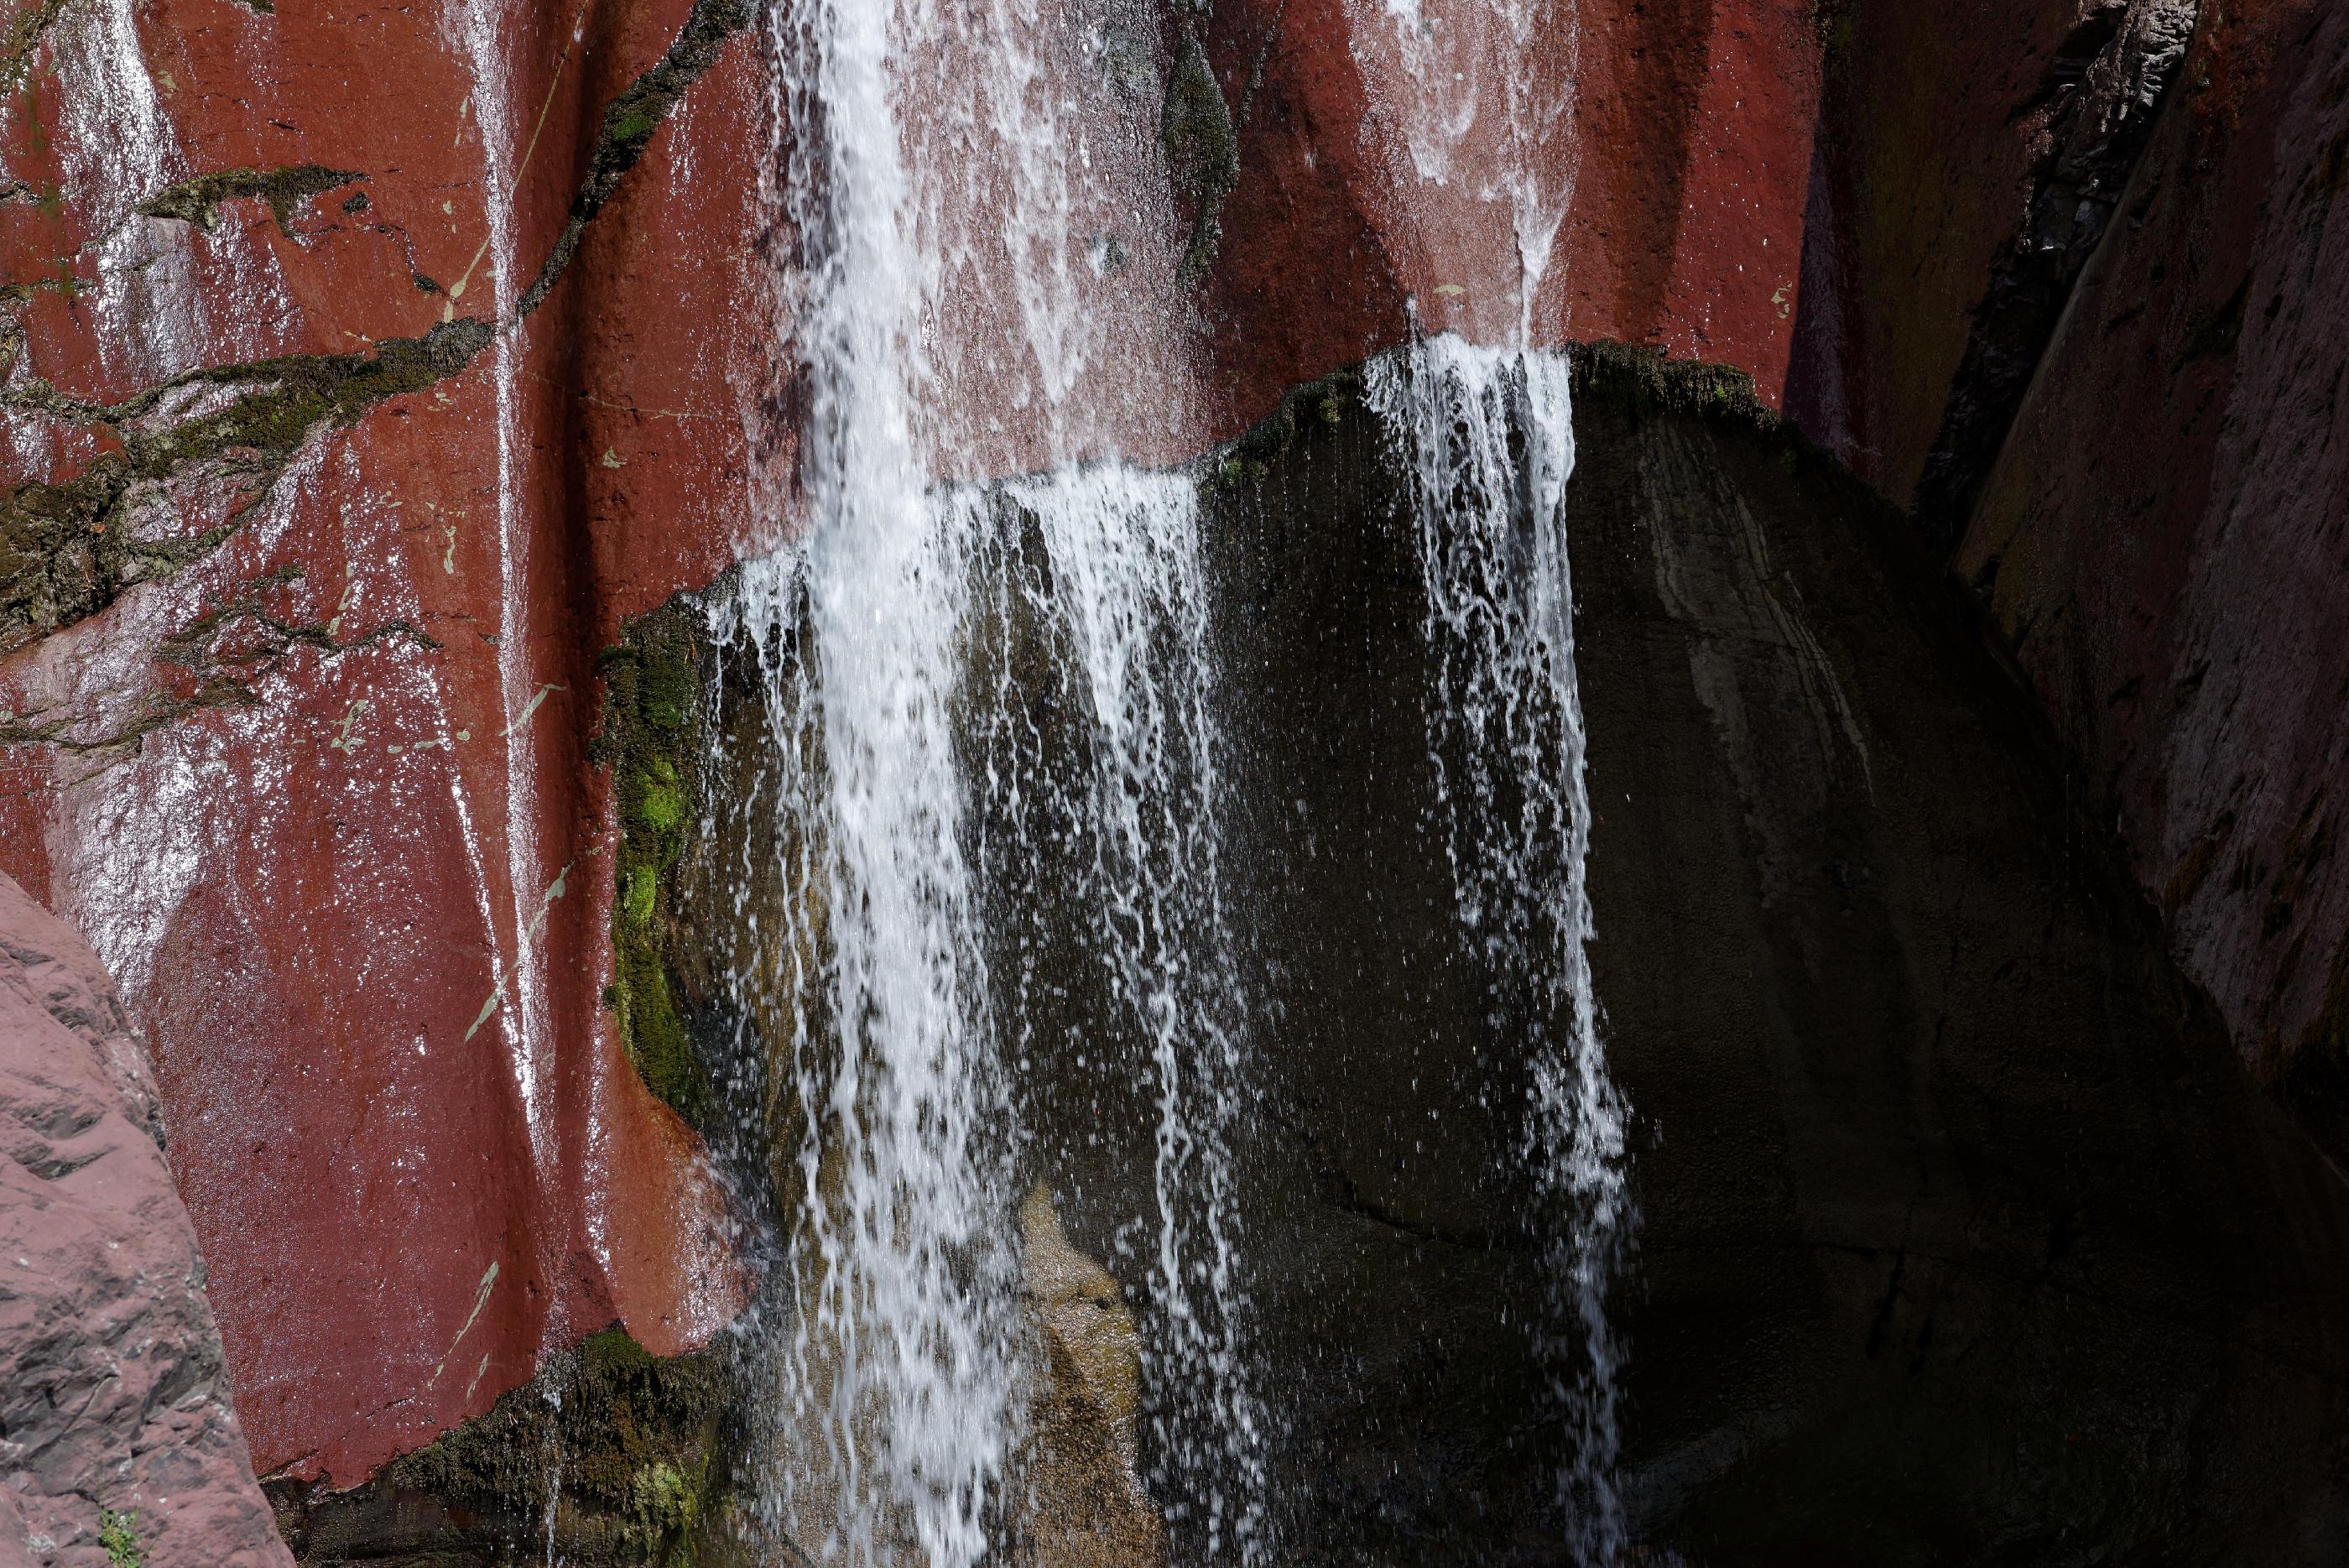 160910-marche-cascade-du-cinca-et-de-la-larri-sobrarbe-aragon-143